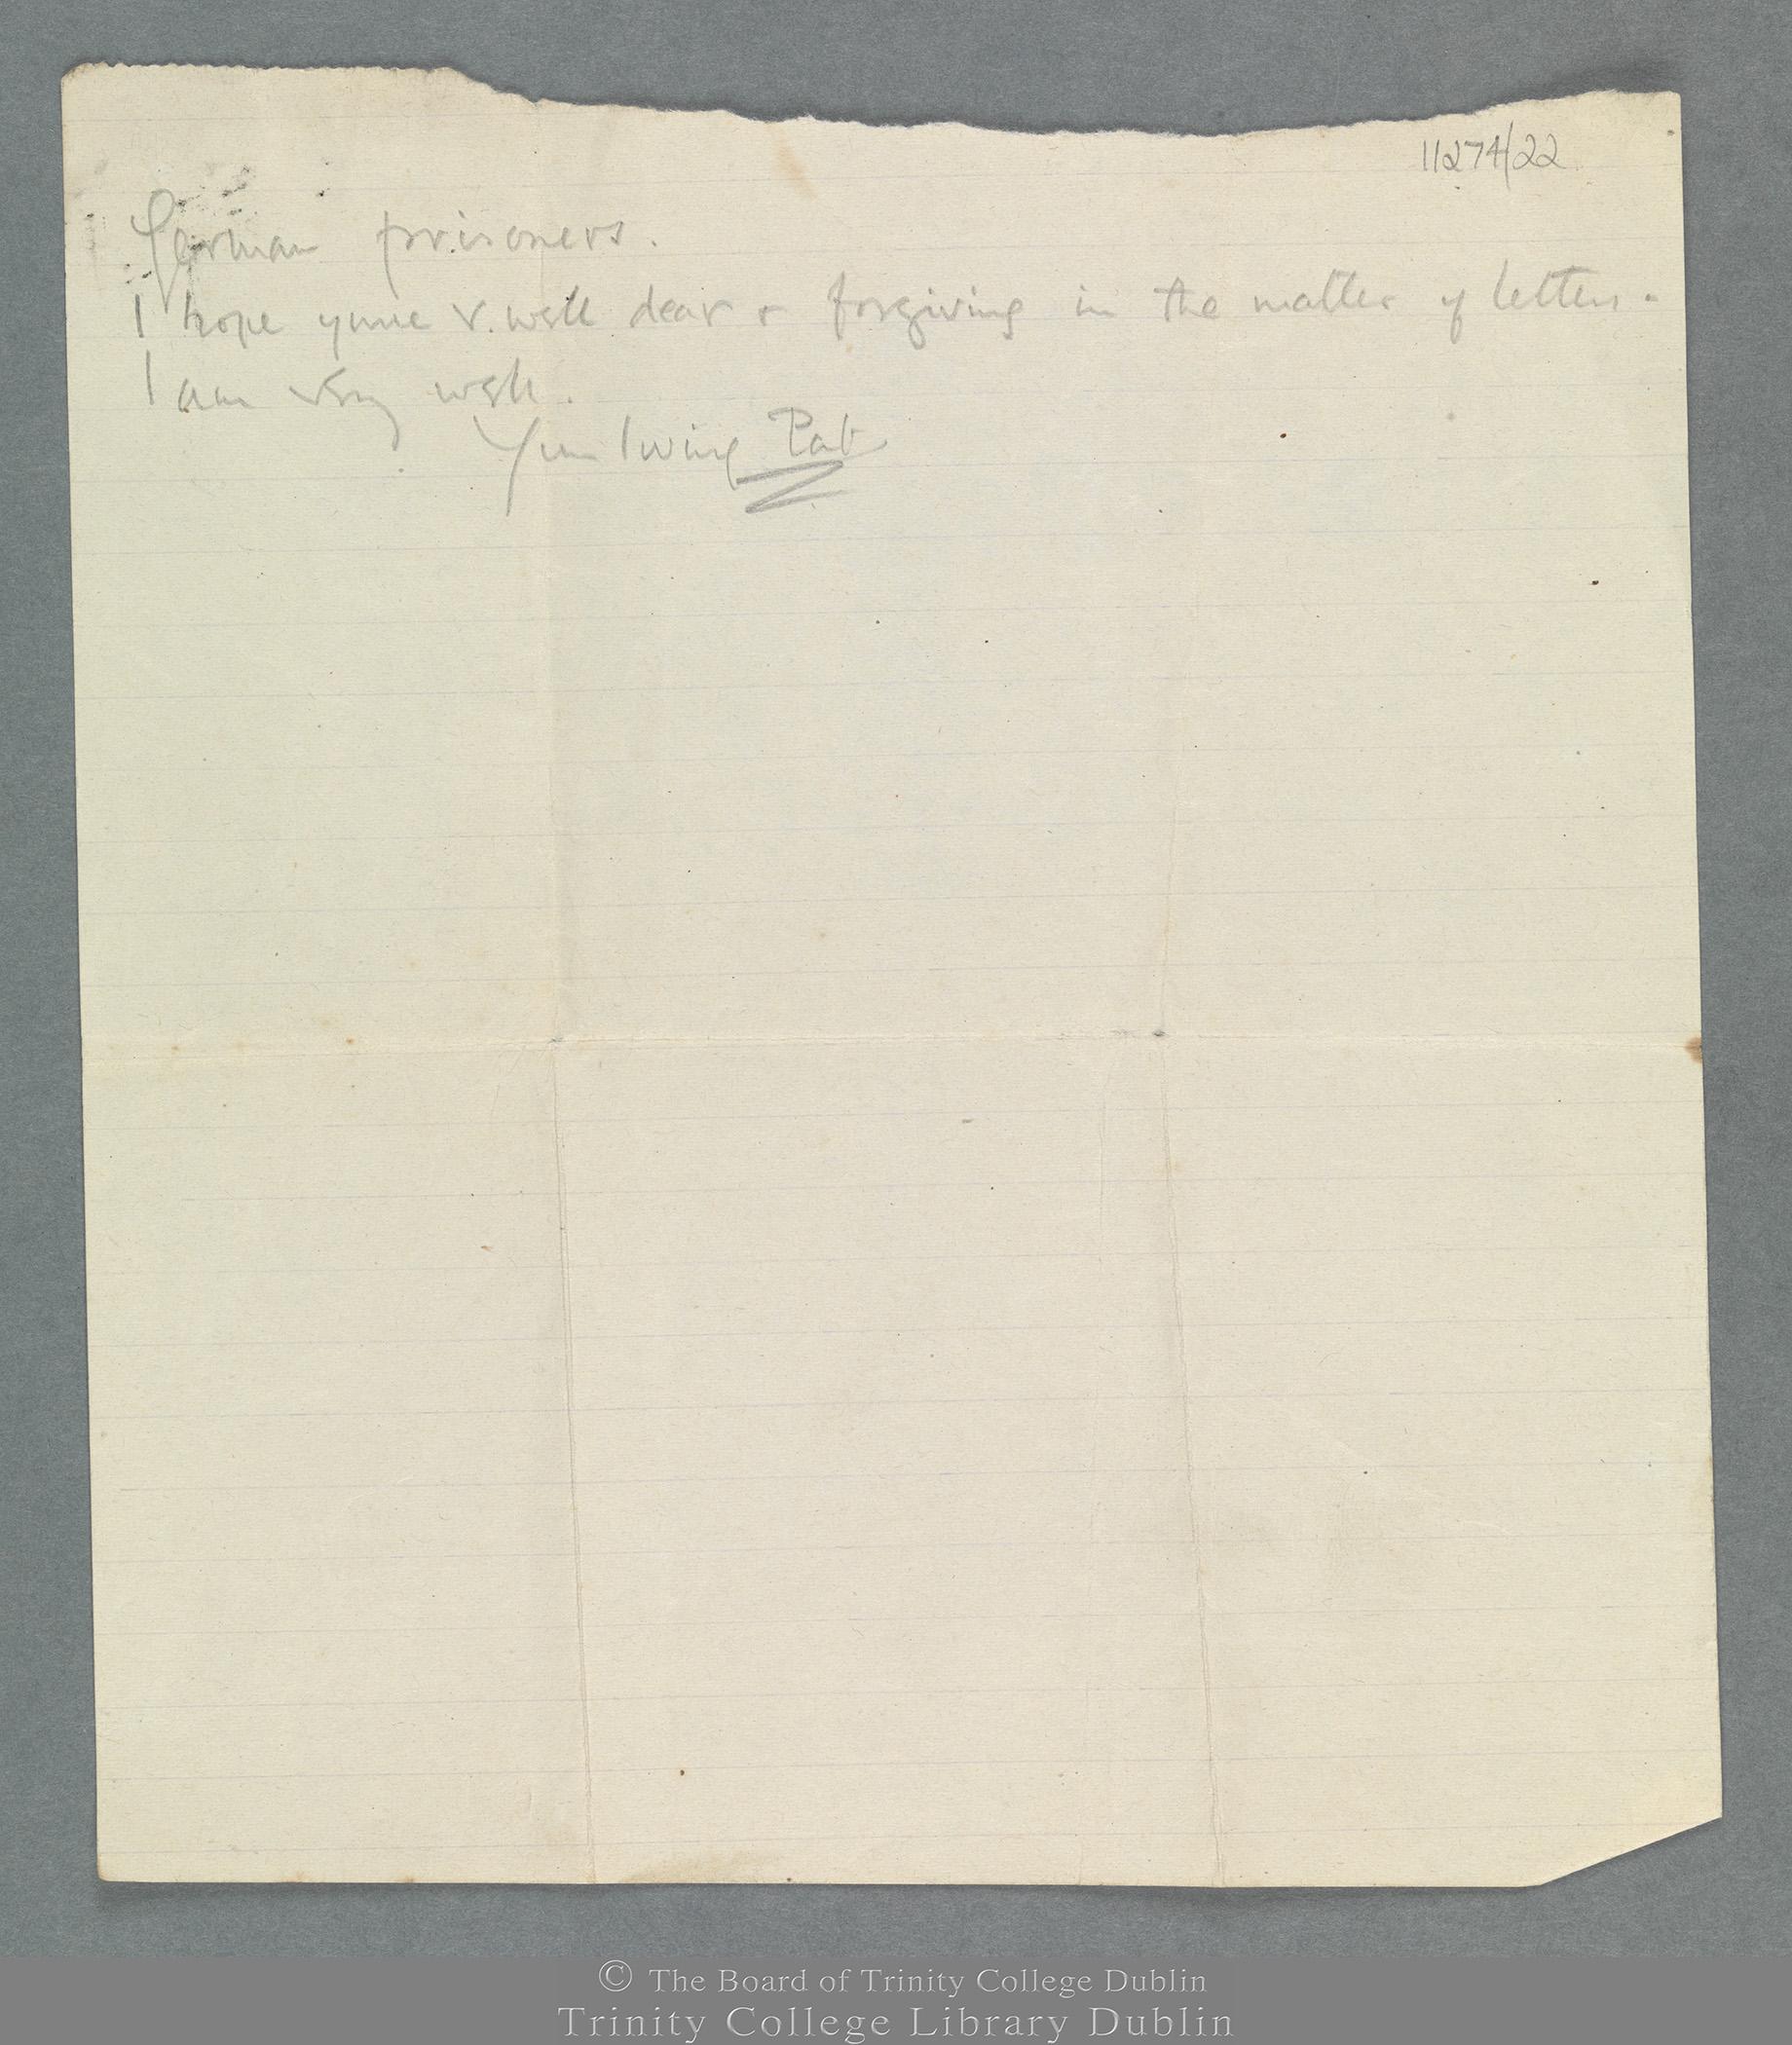 TCD MS 11274/22 folio 3 recto